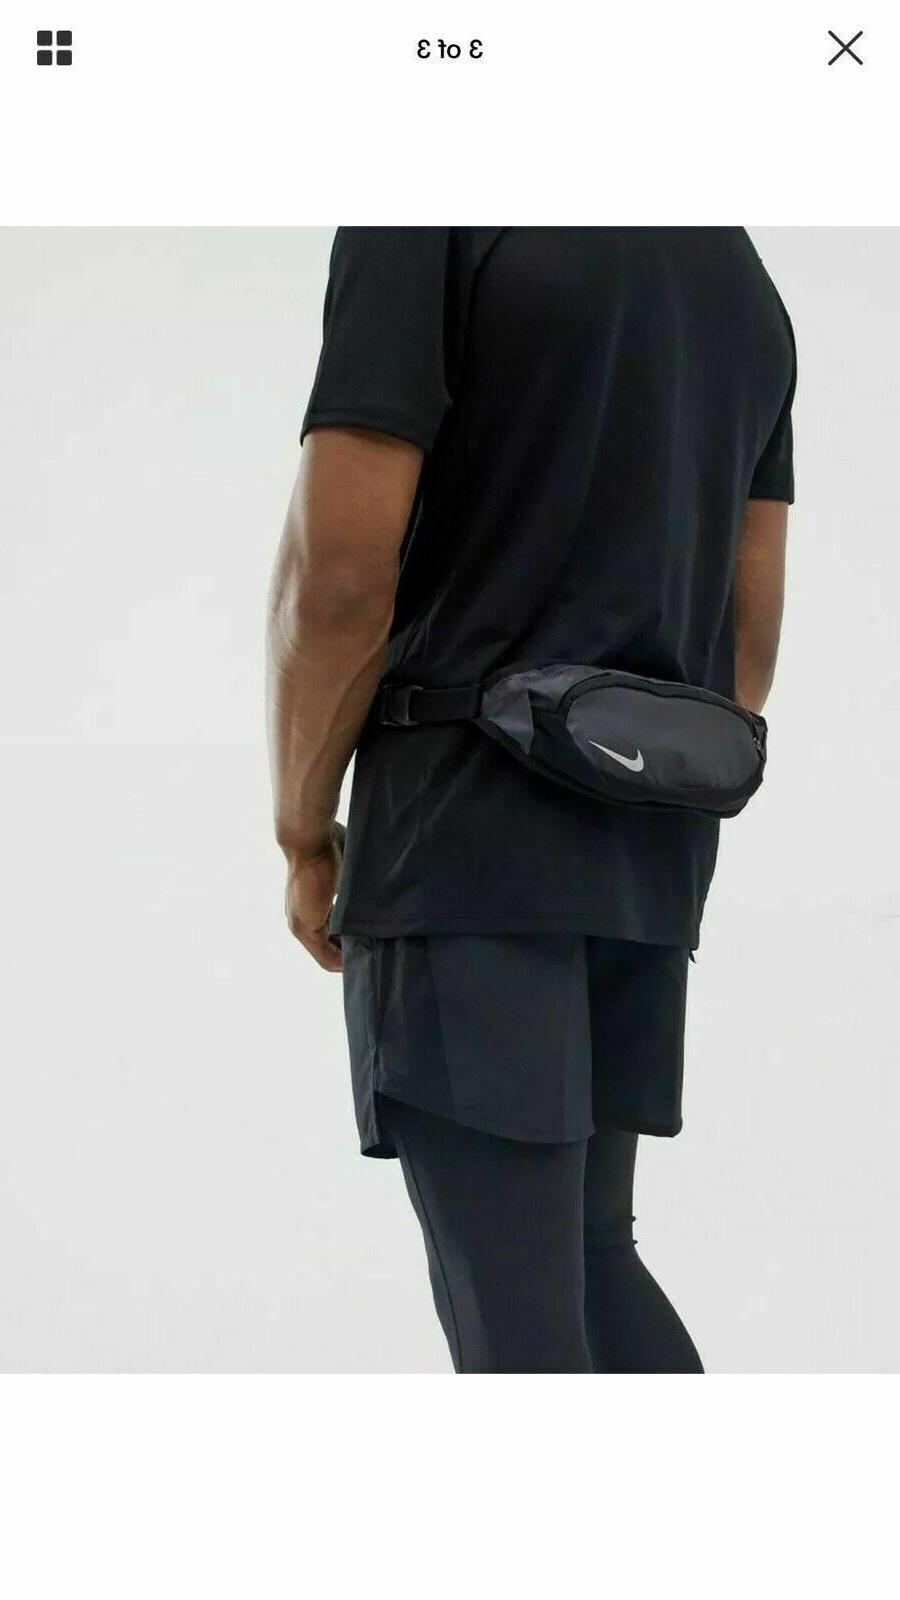 Nike Capacity Running WAISTPACK Pack Black 2 NWT